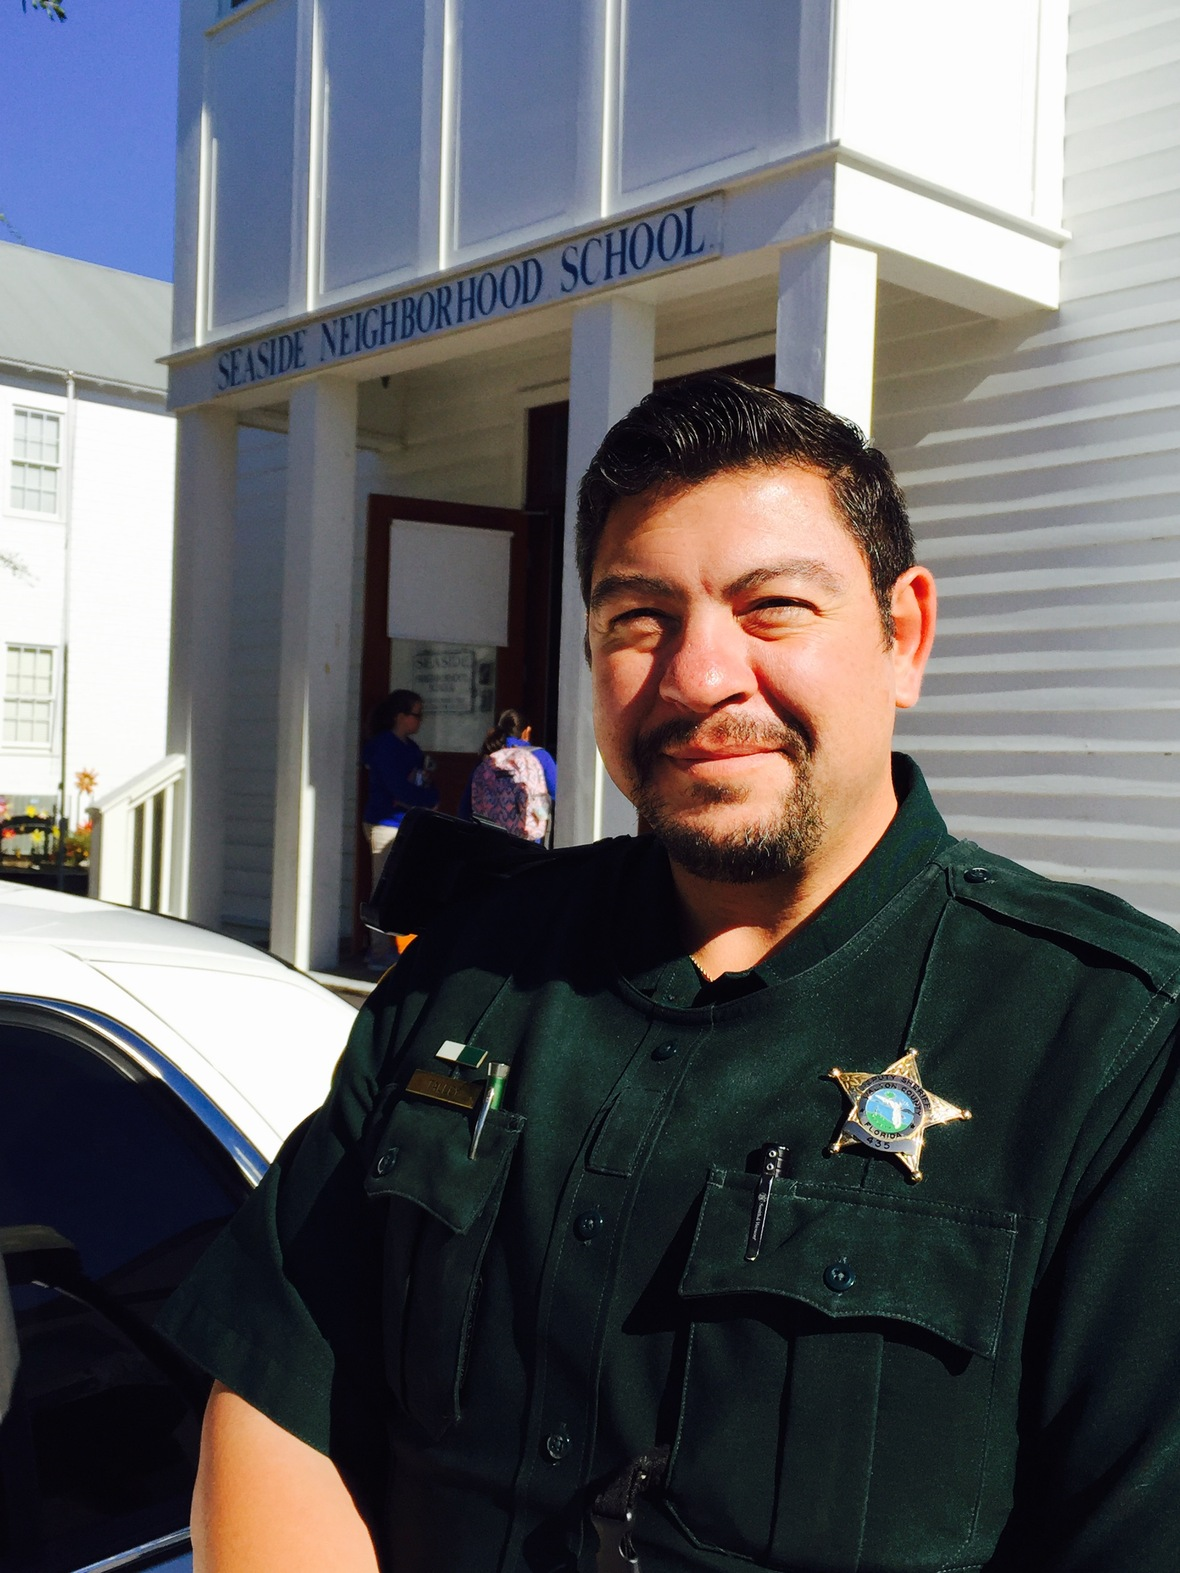 Deputy David Talley